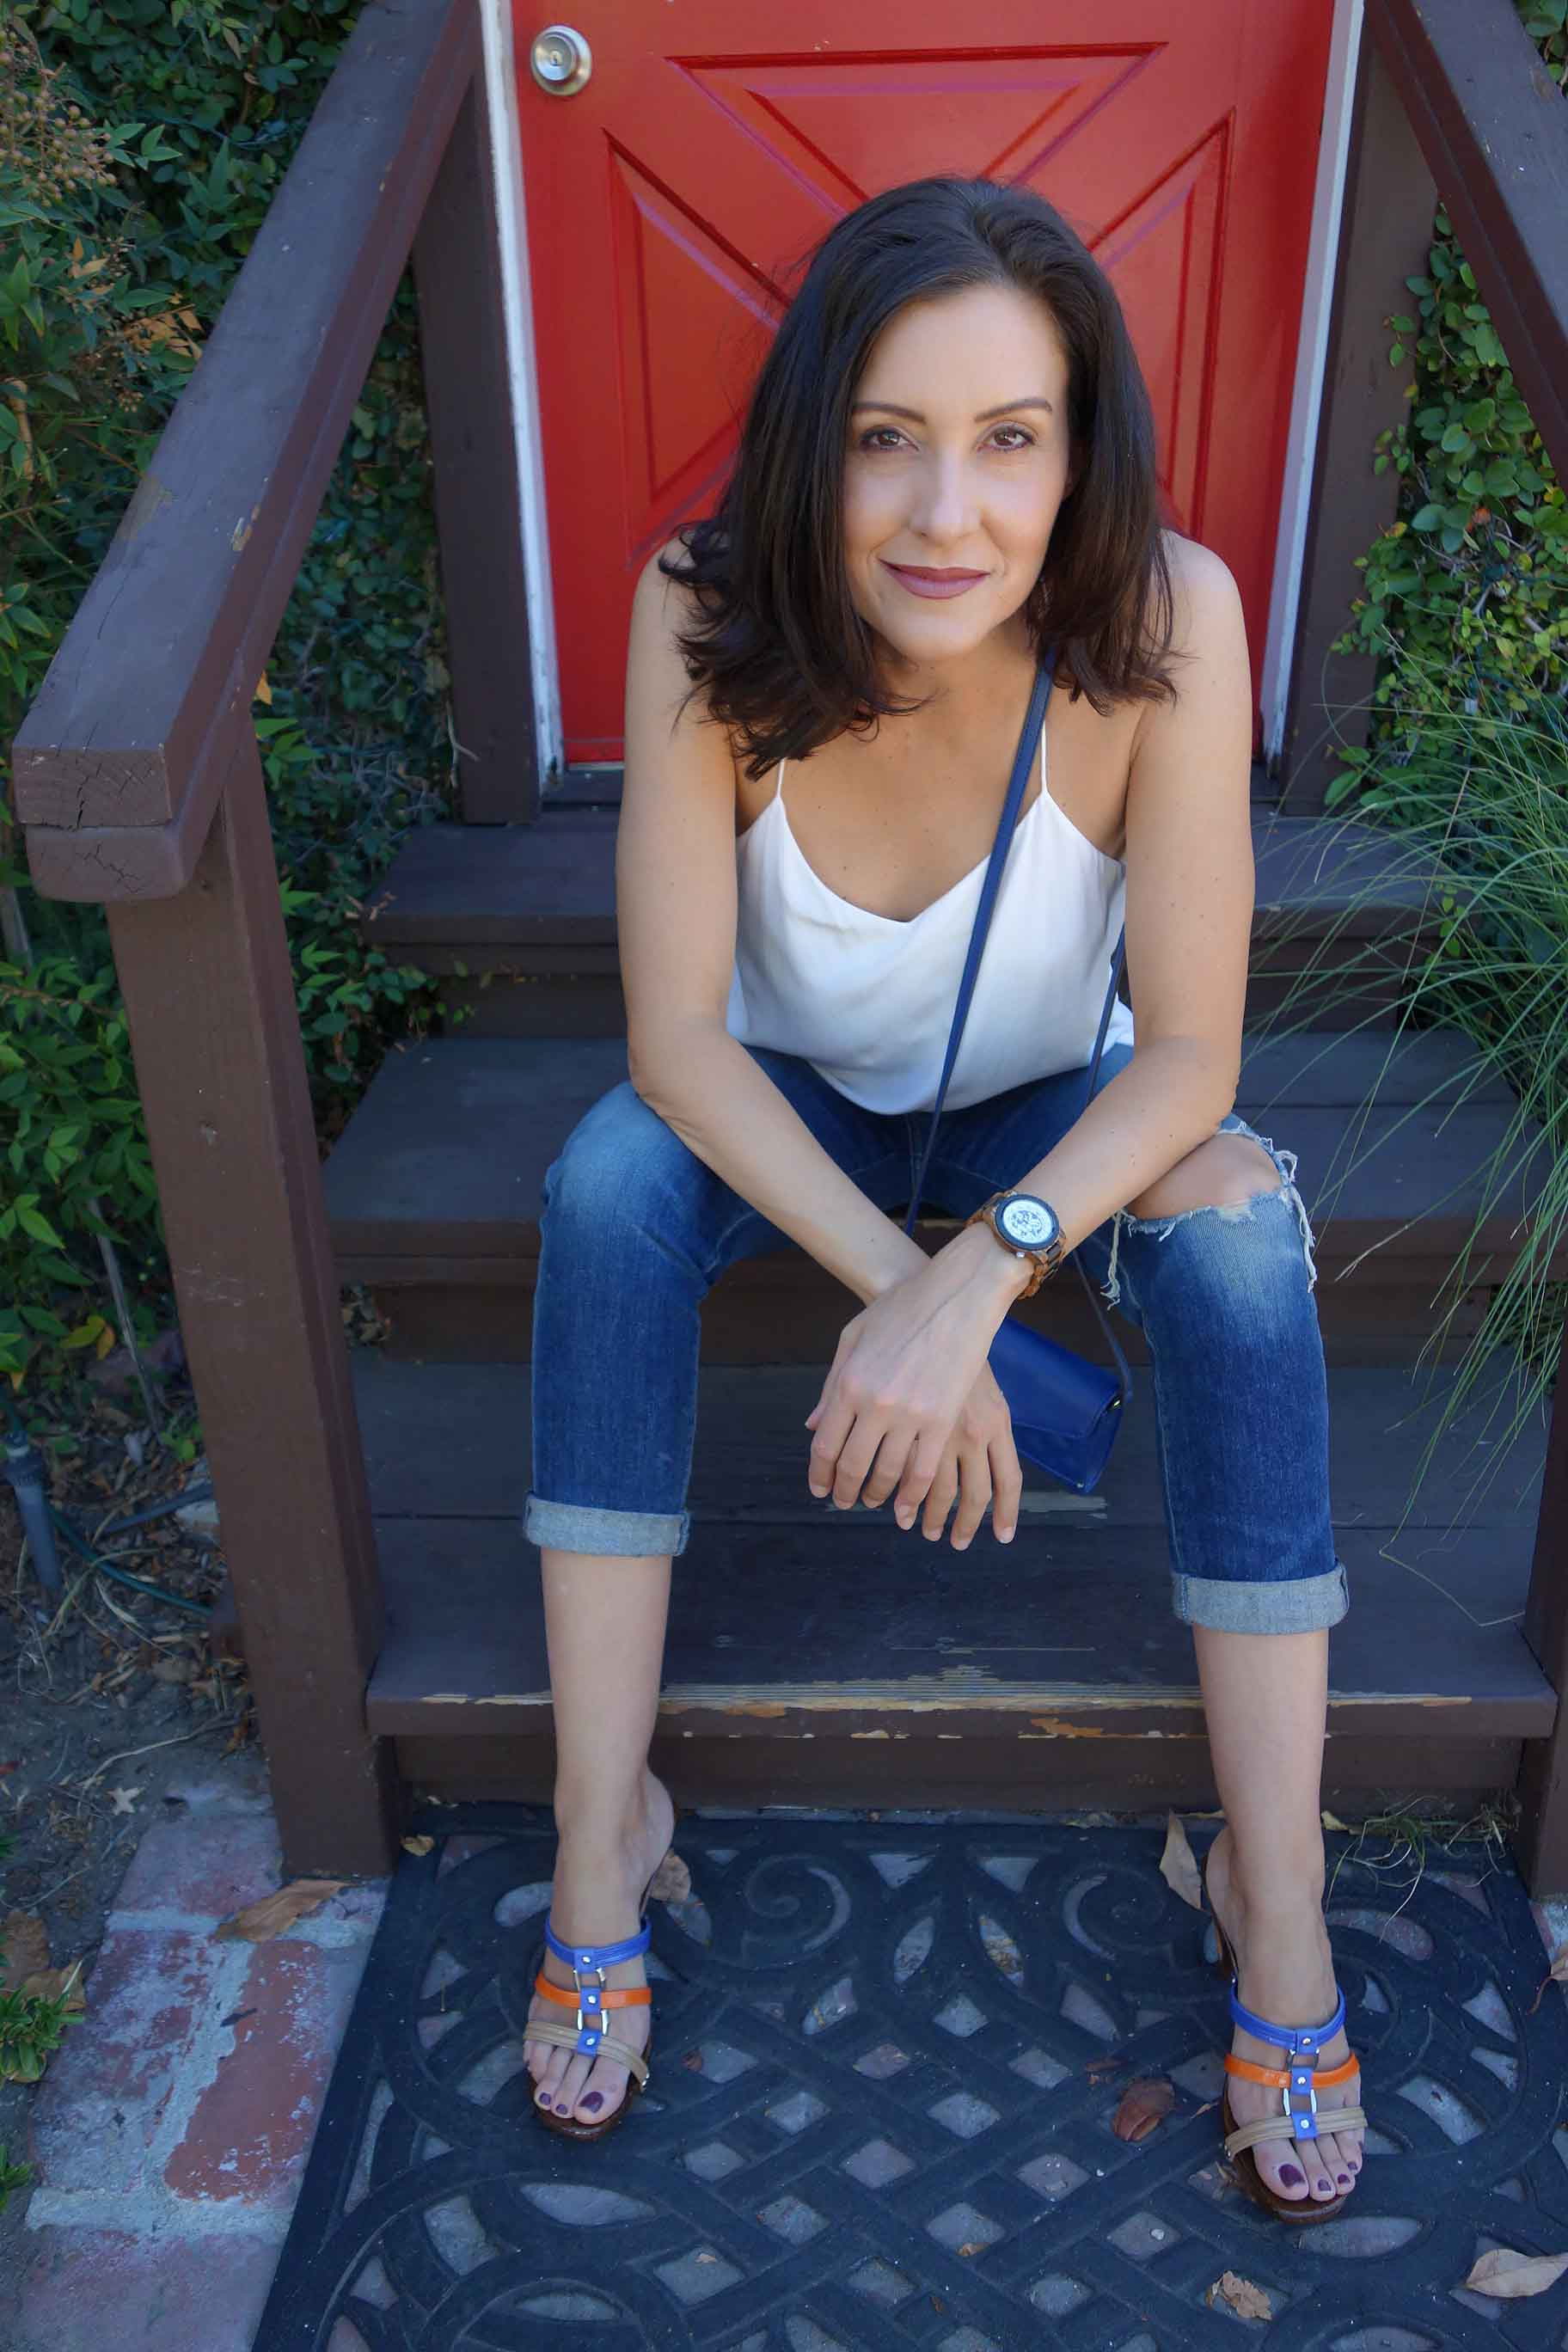 Jacqueline Depaul #jordwatch 1